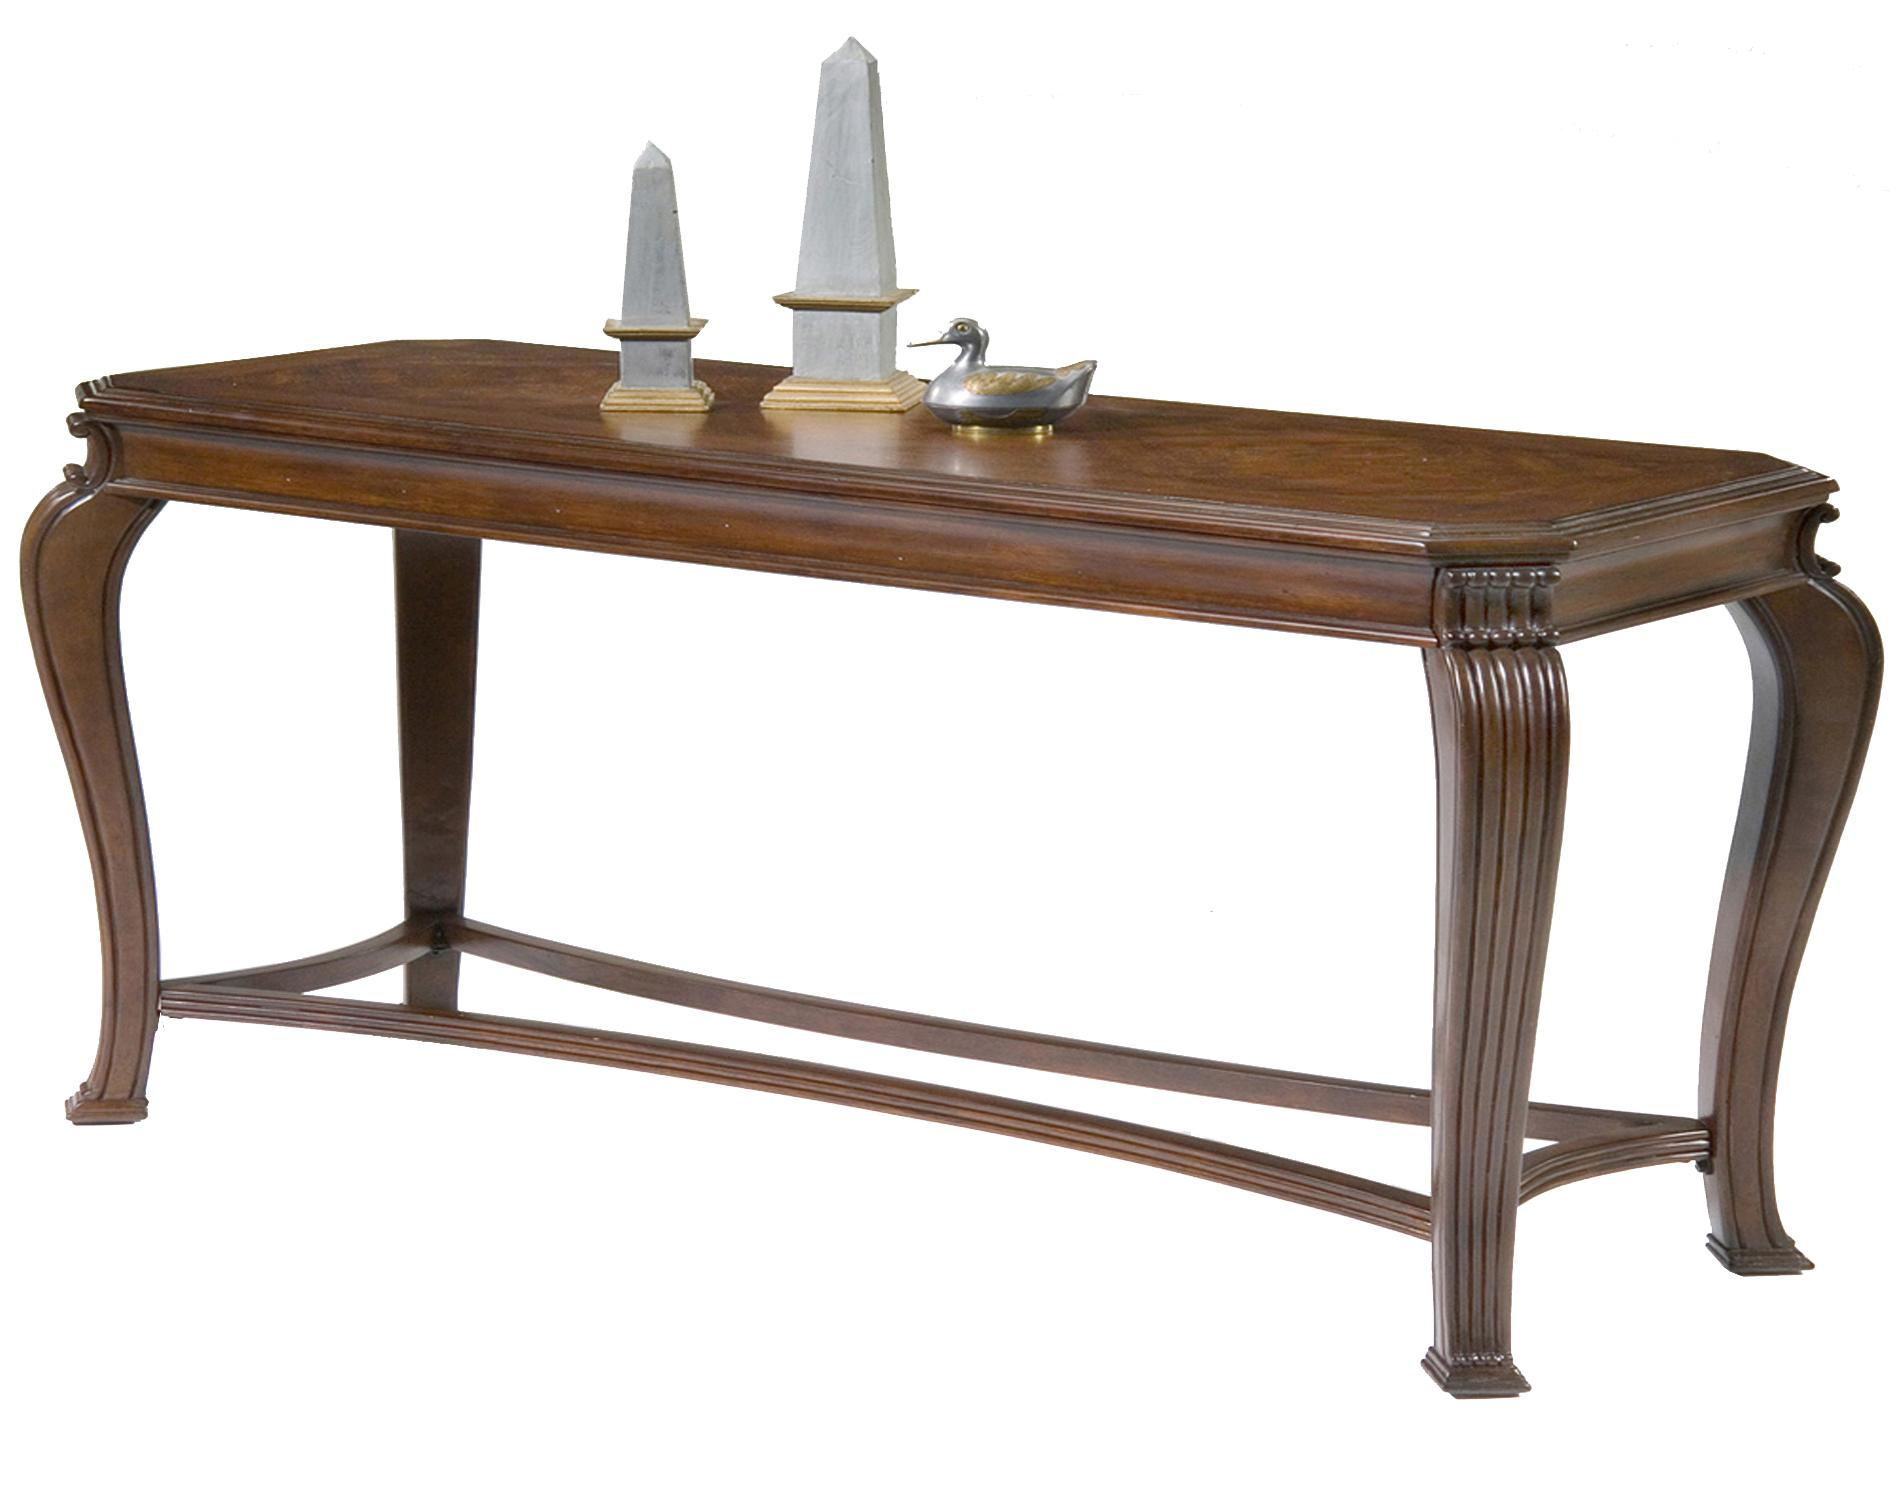 Liberty Furniture Ellington Sofa Table - Item Number: 741-OT1030